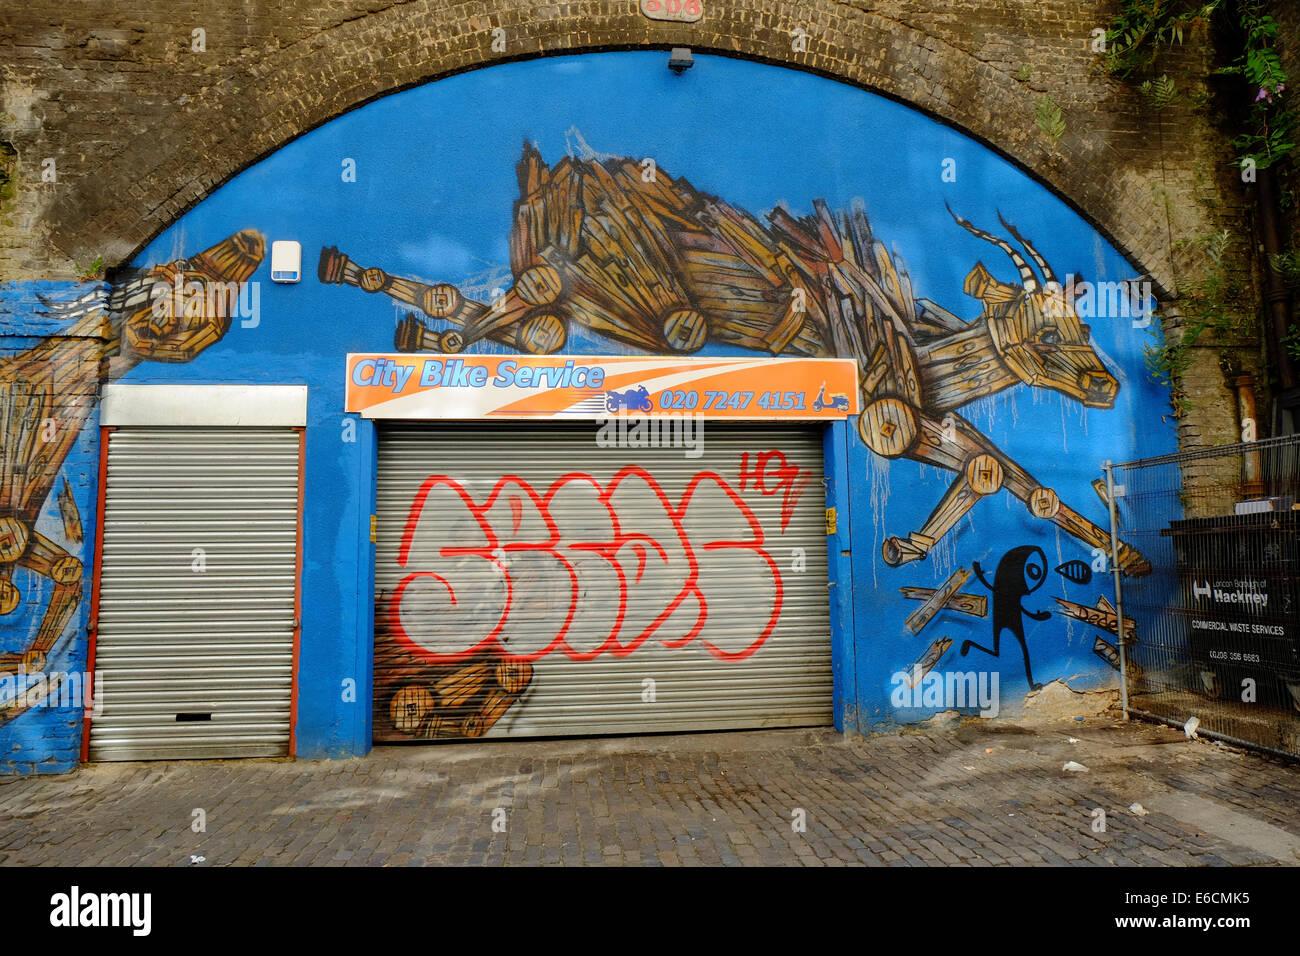 City Bike Service with leaping goats graffiti art in Shoreditch, London - Stock Image